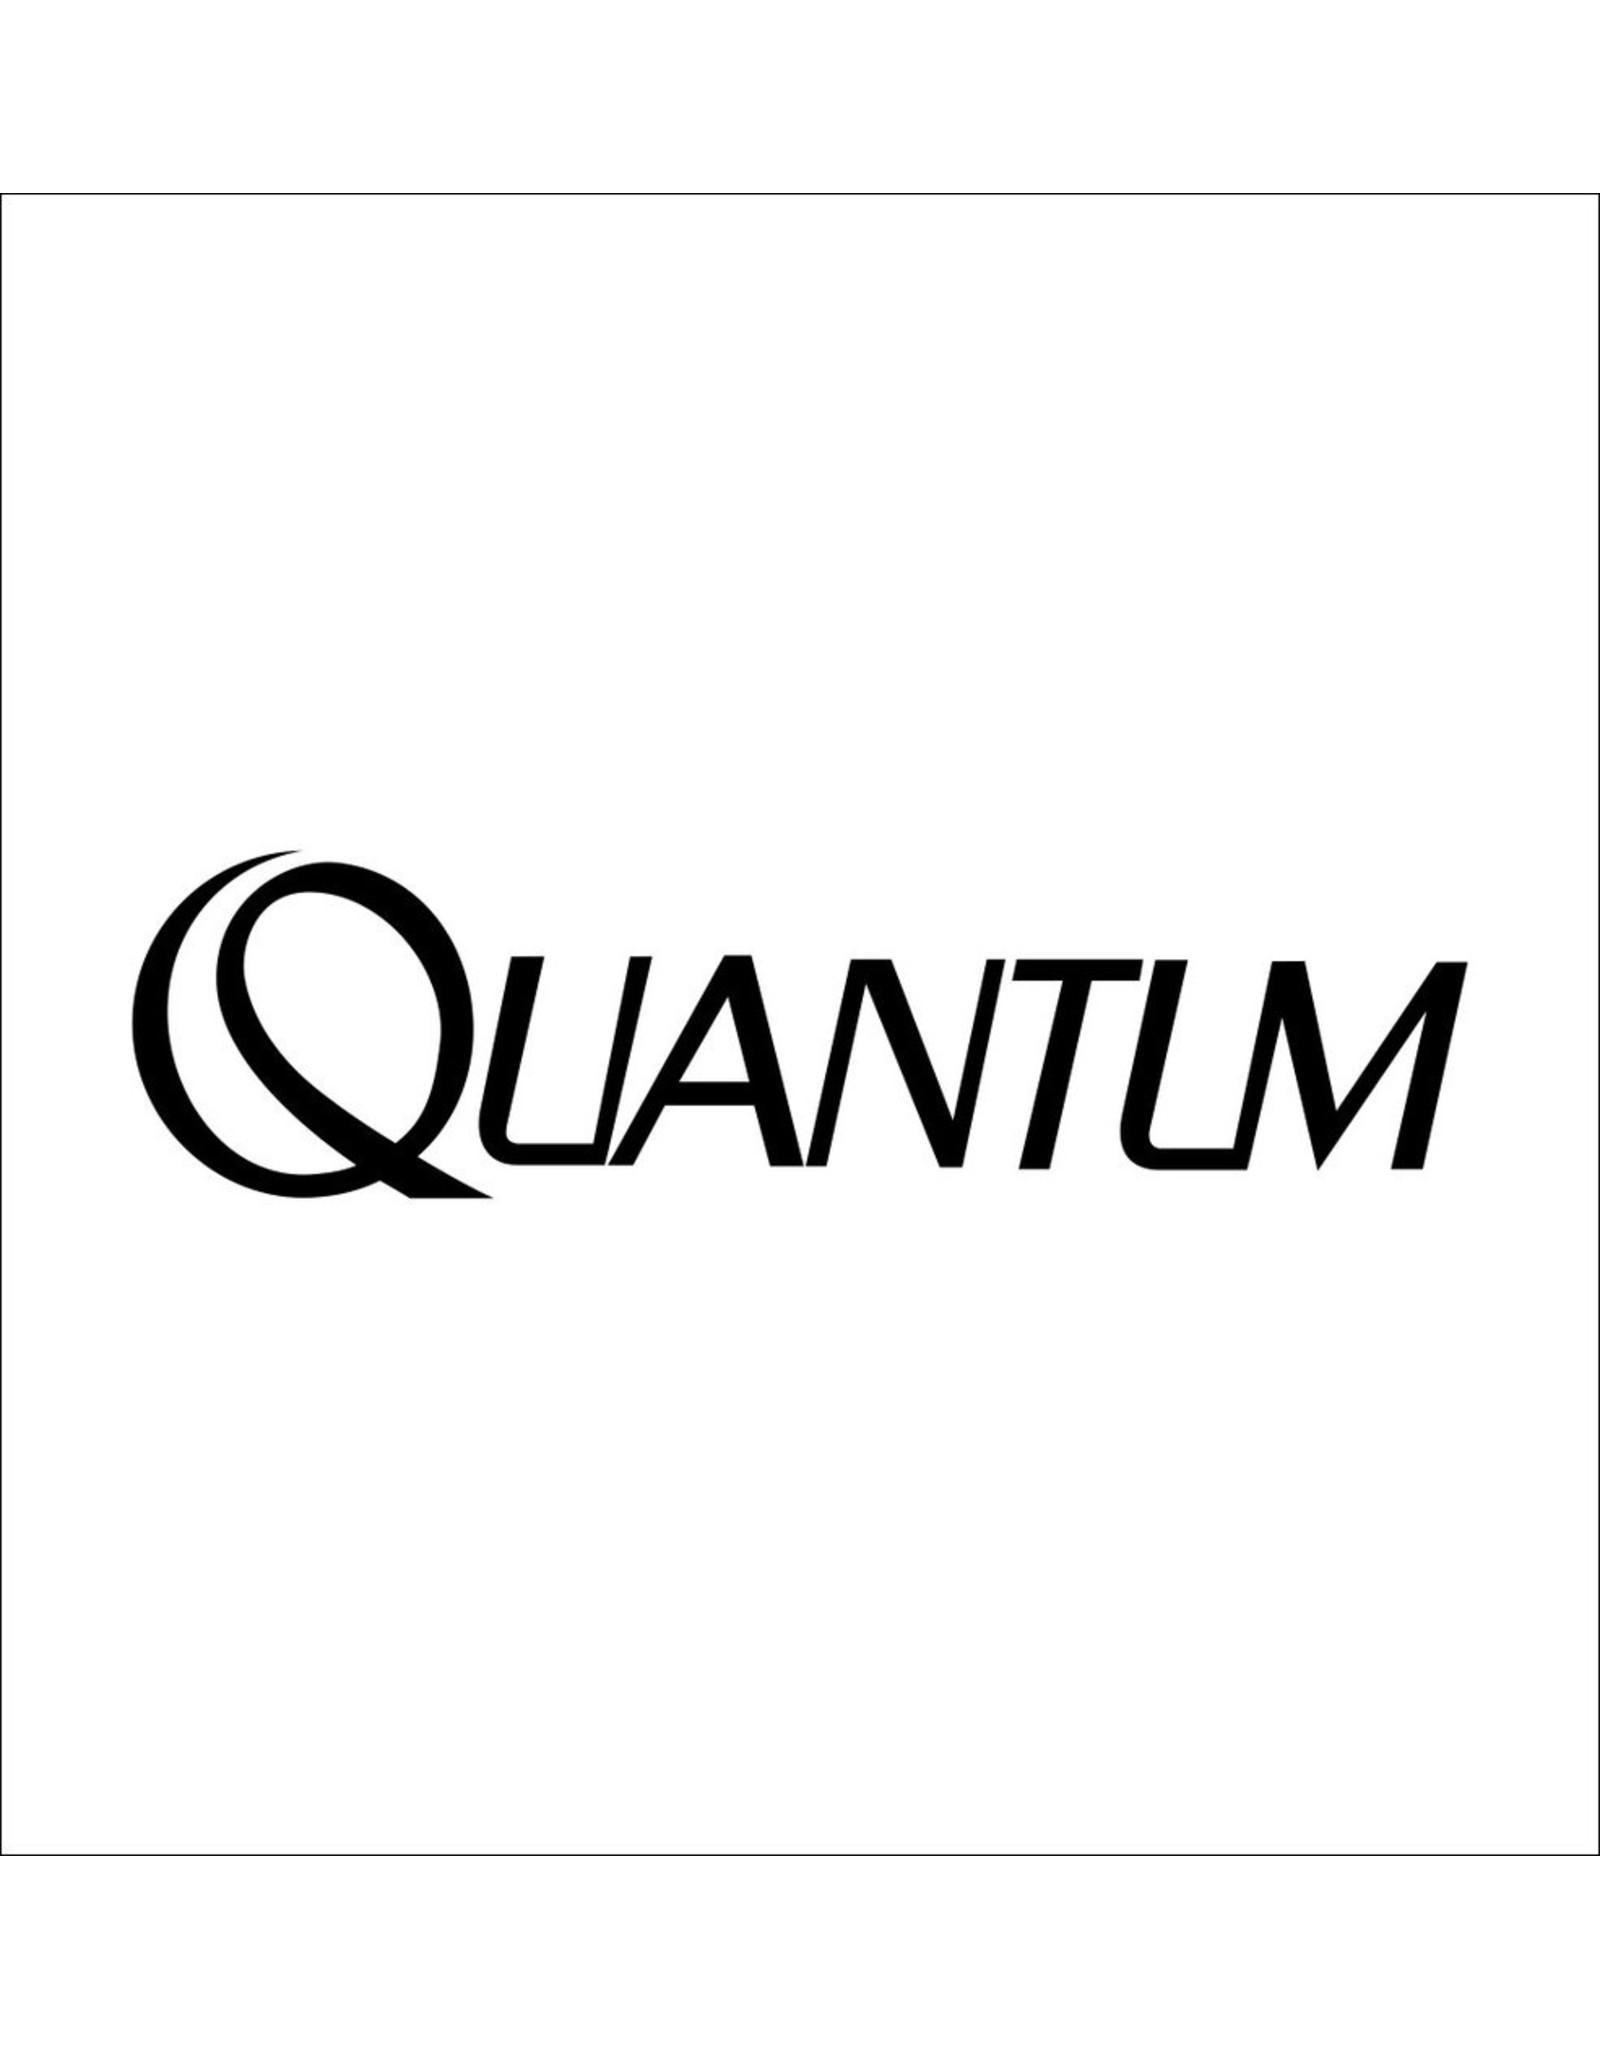 Quantum BODY REAR COVER